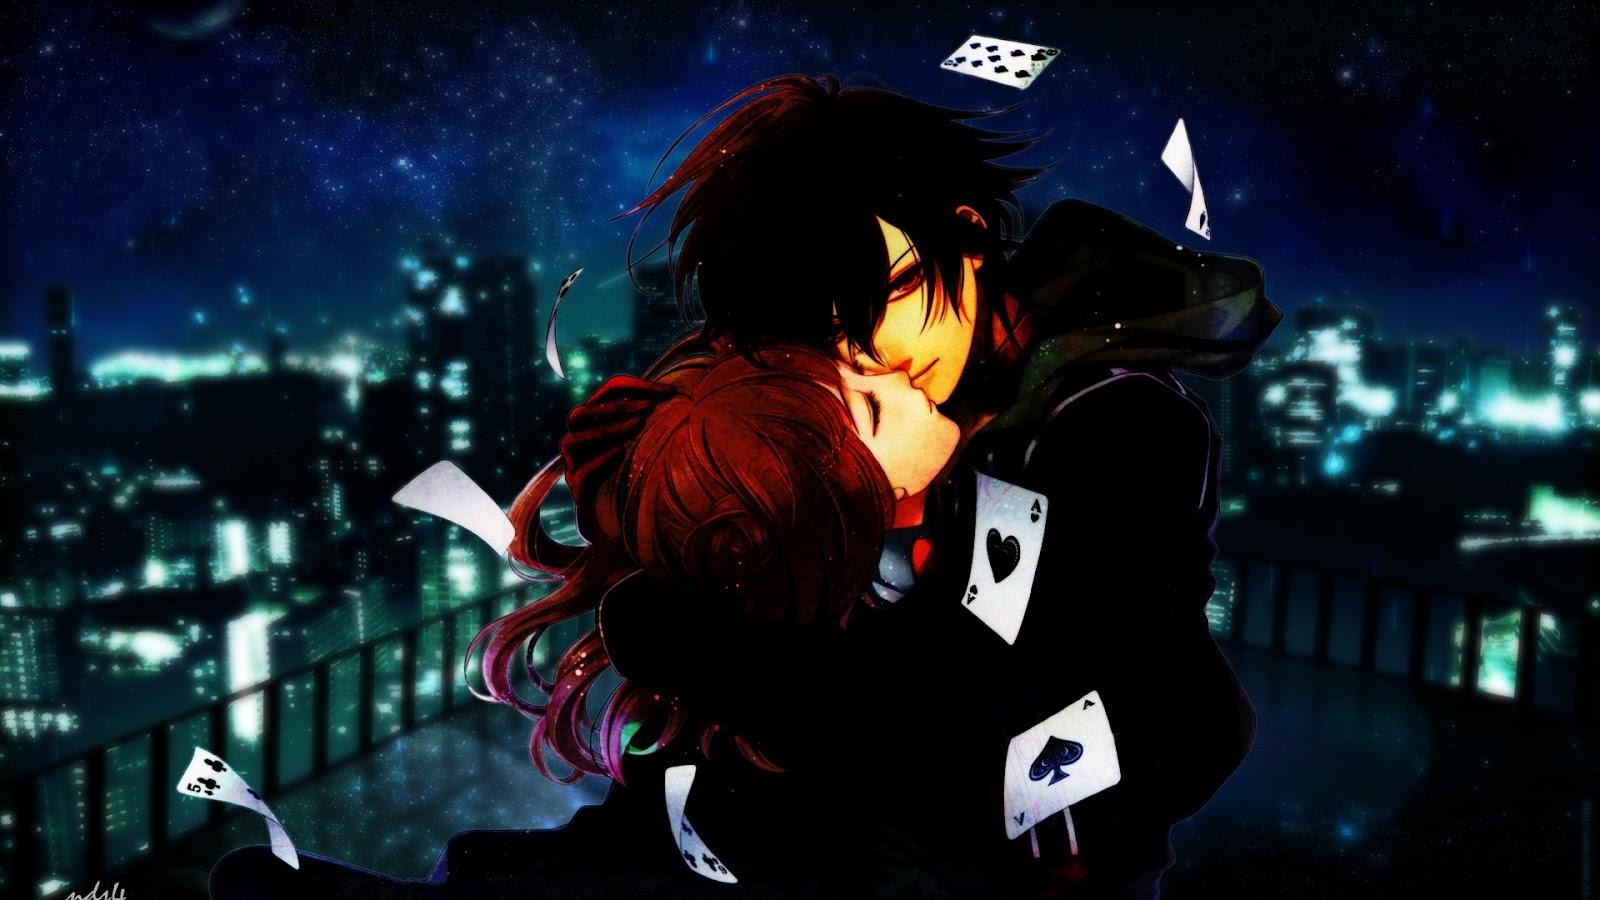 Letest Hd Wallpaper Coupale Kiss